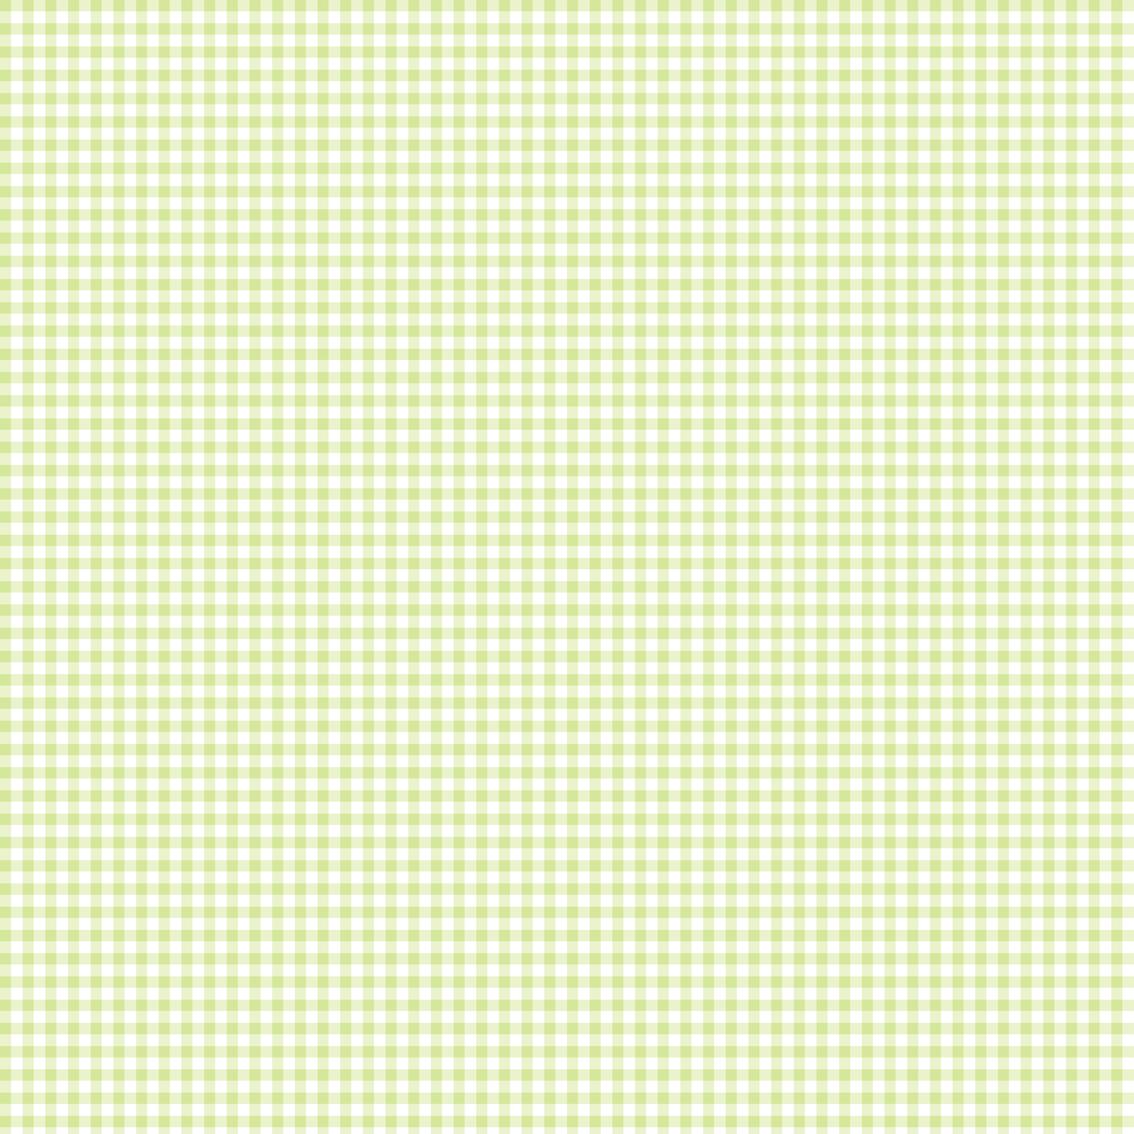 Free Digital And Printable Gingham Scrapbooking Paper Ii Green